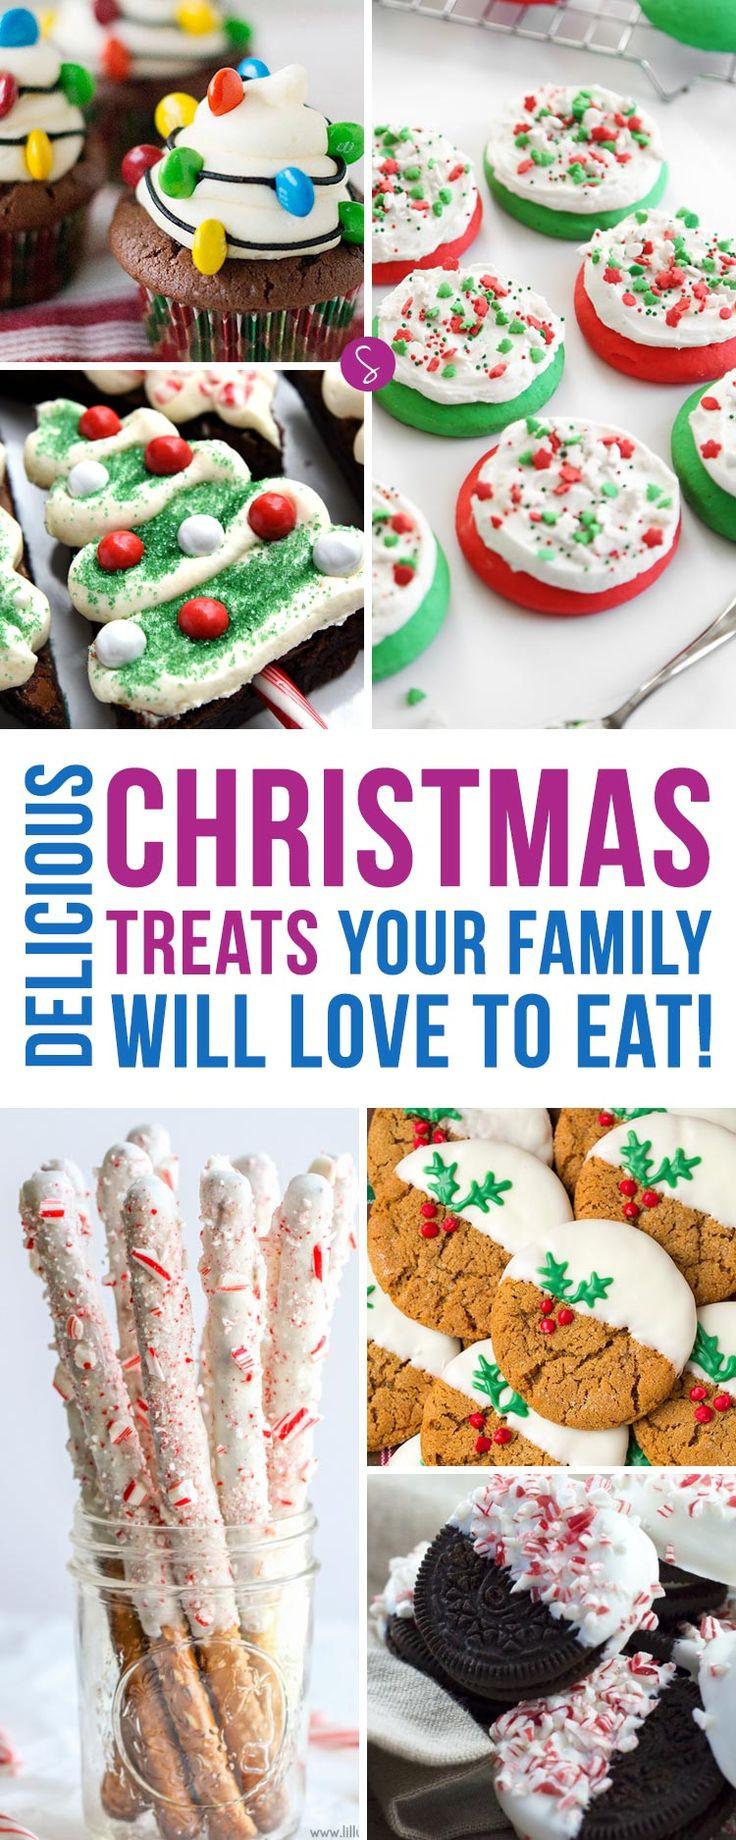 Homemade Christmas Cookies For Sale  1000 Bake Sale Ideas on Pinterest